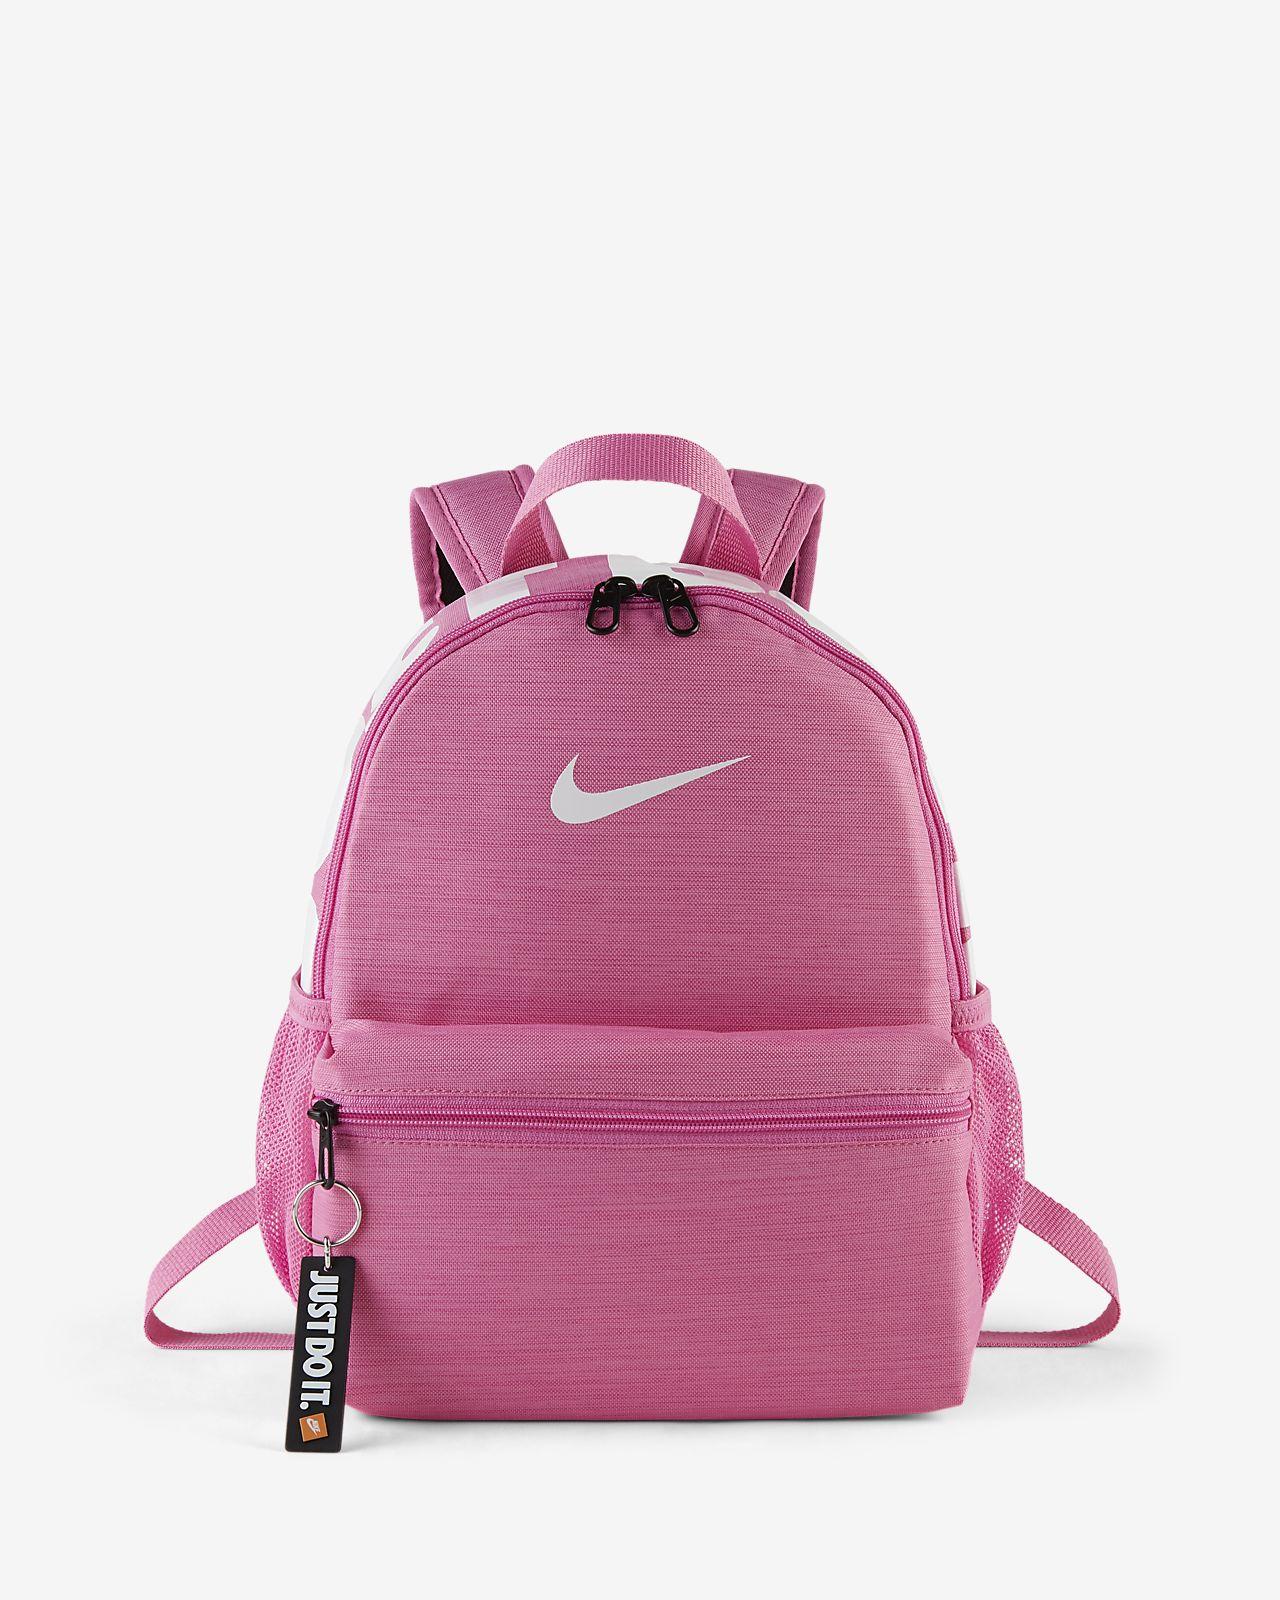 Nike Brasilia Just Do It gyerek hátizsák (mini)